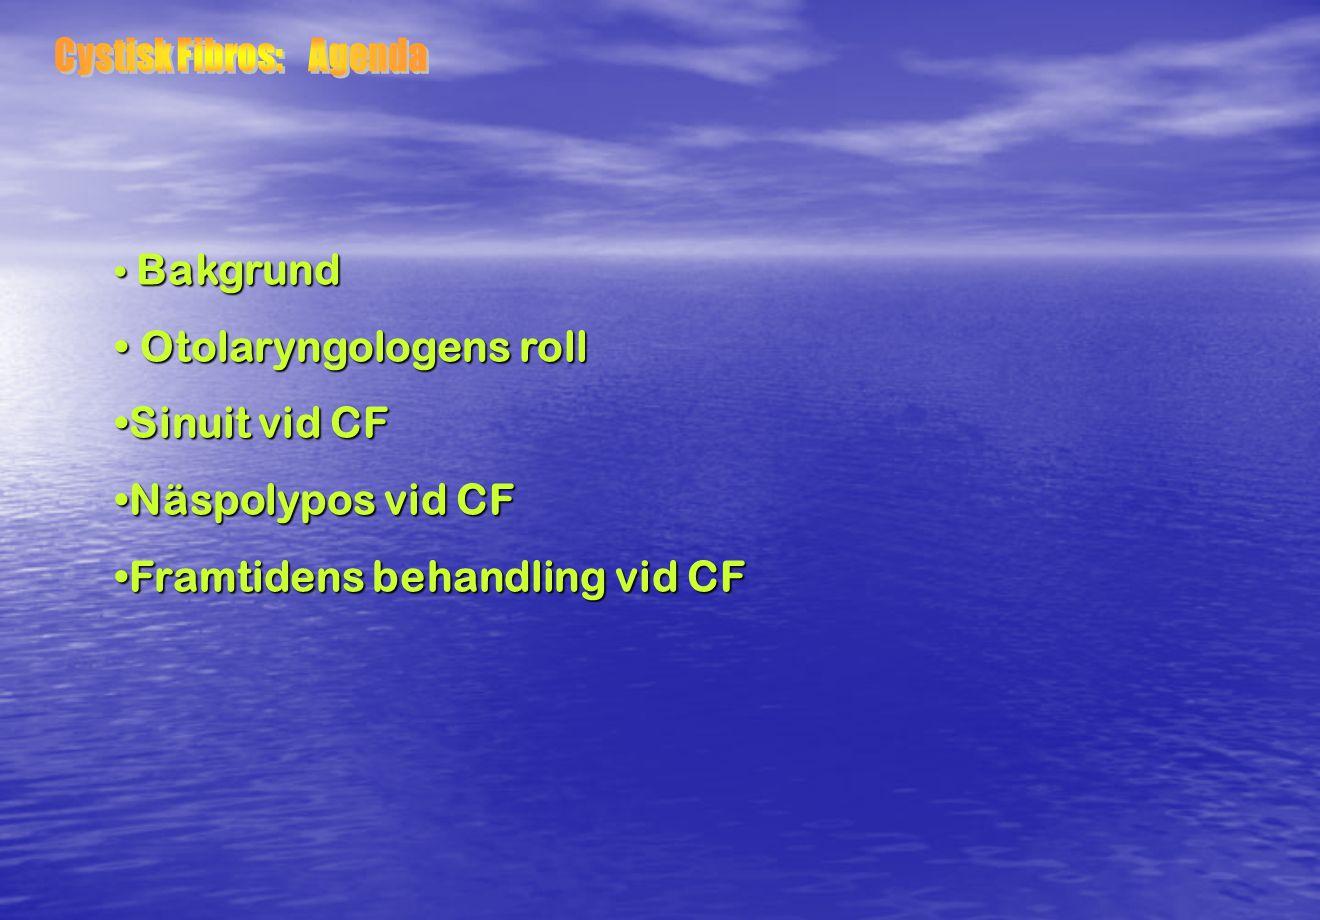 Cystisk Fibros: Agenda